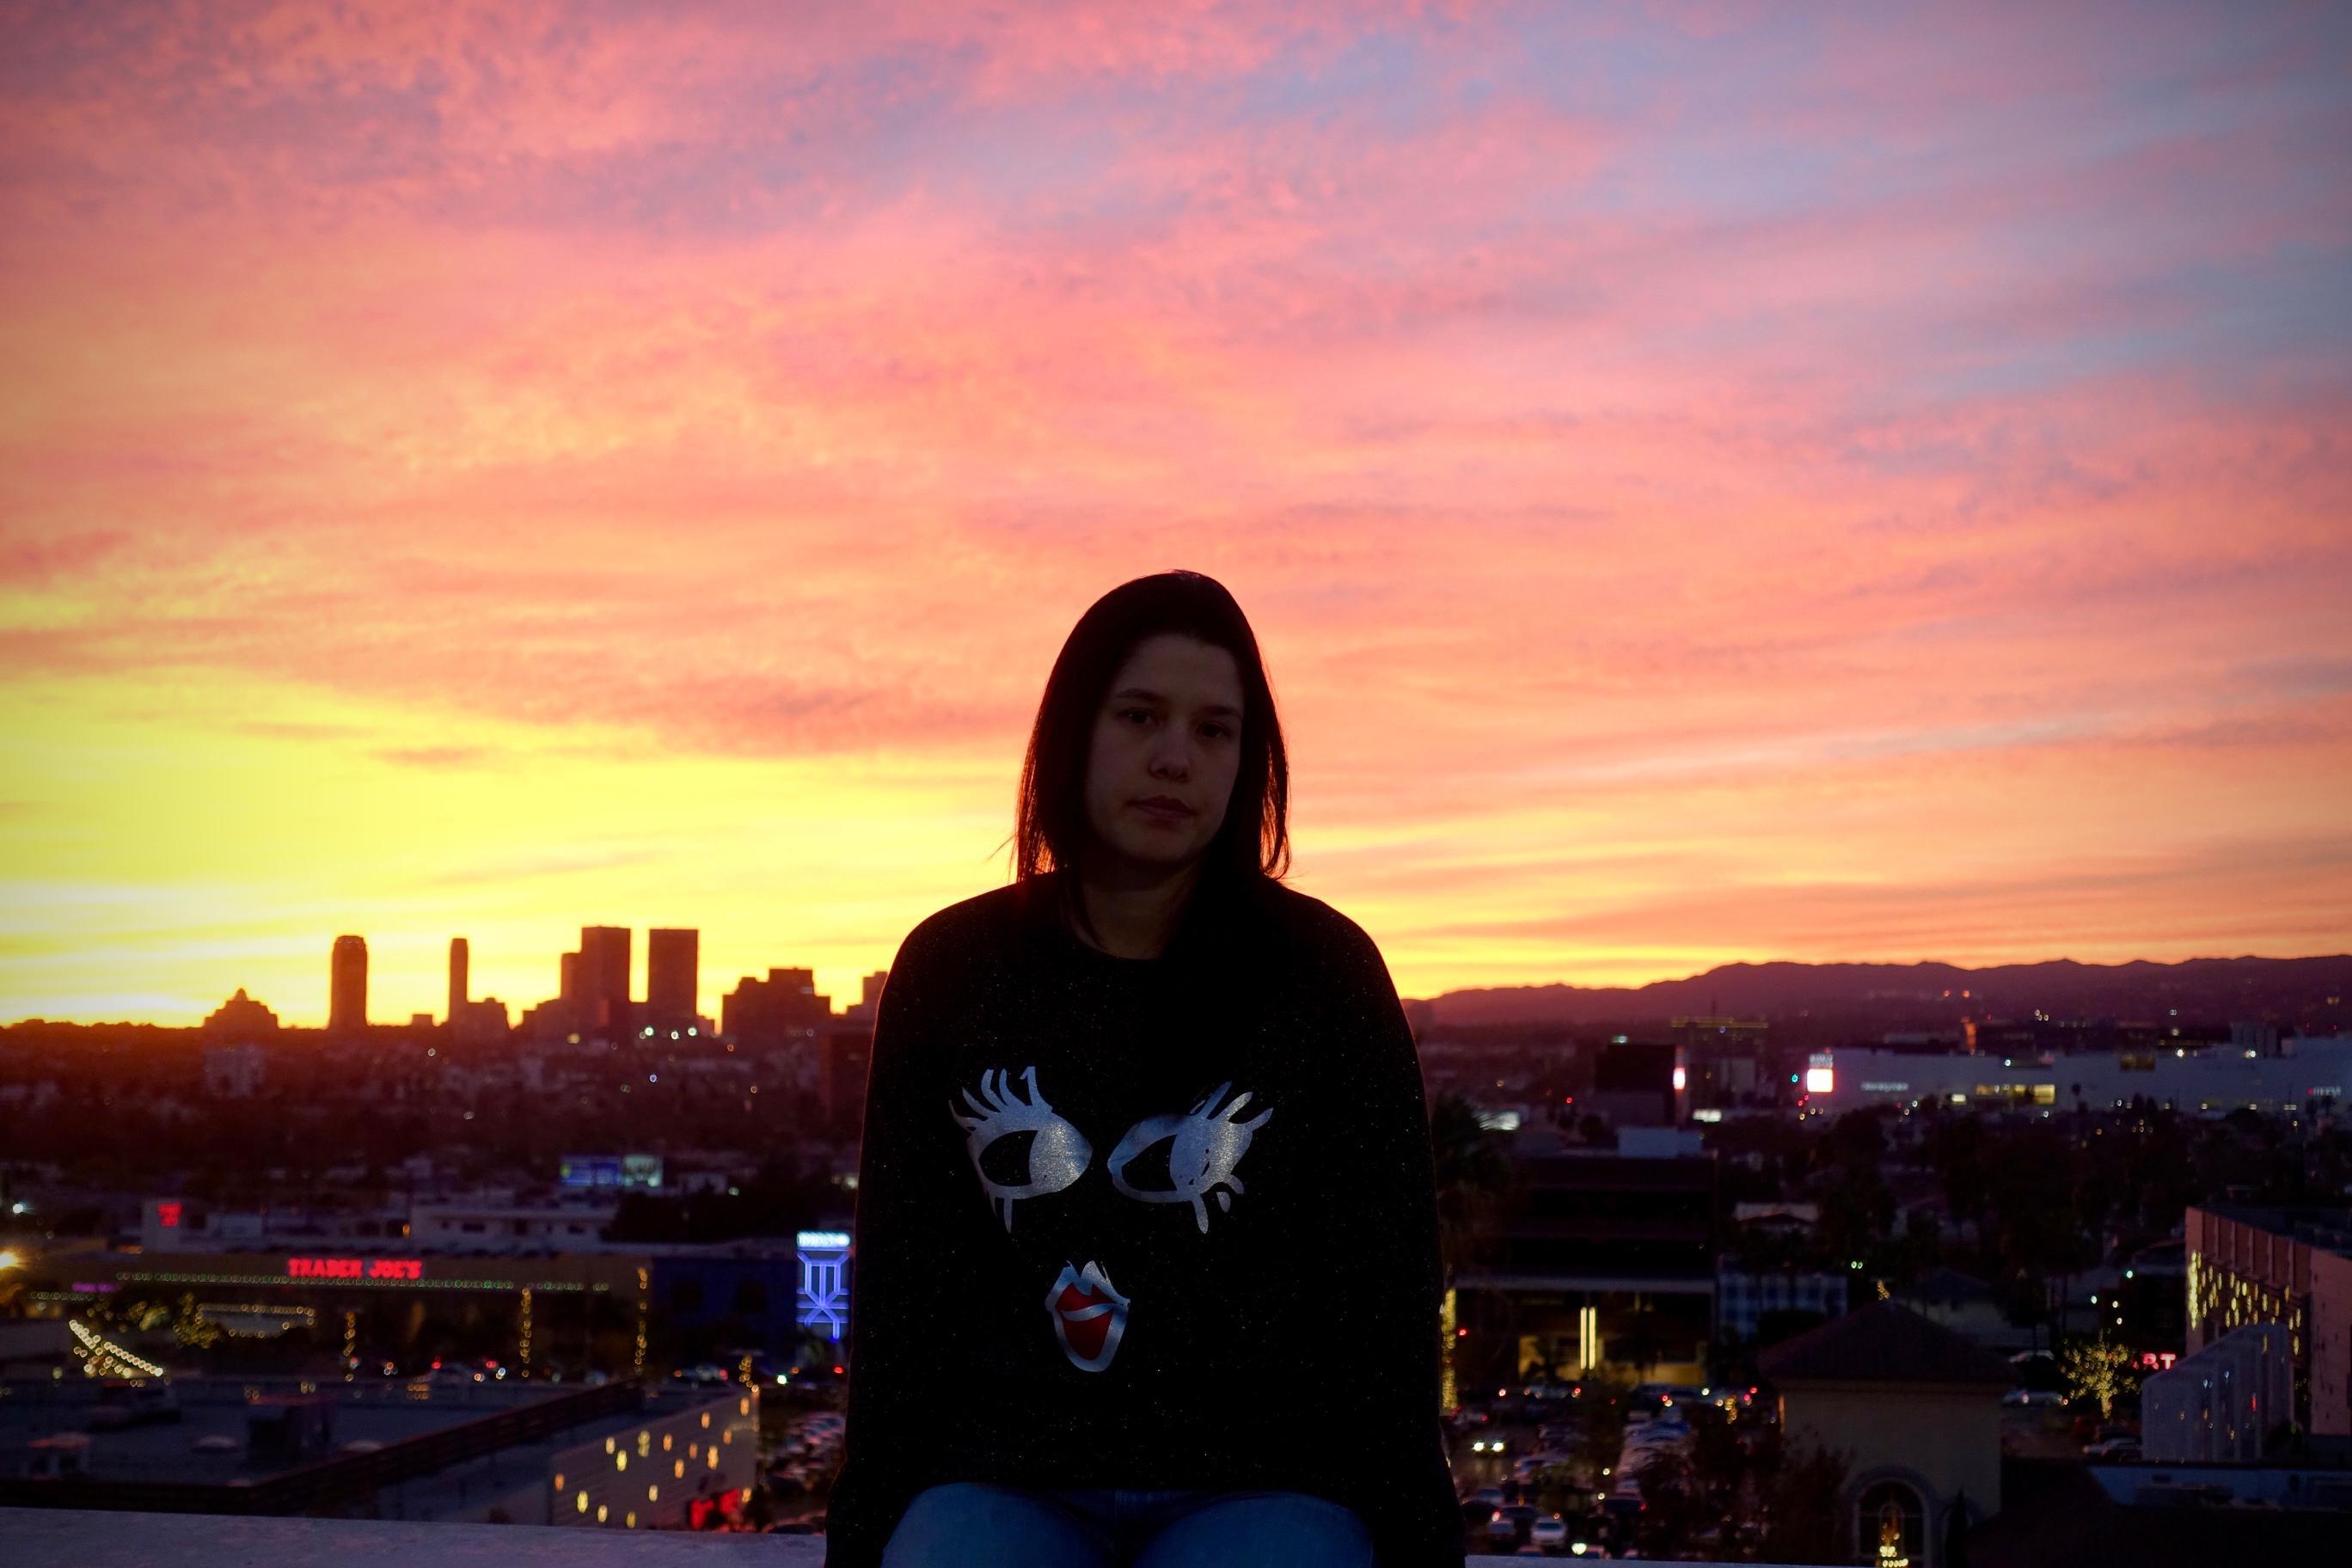 Marina Dias Barros Prado | Los Angeles